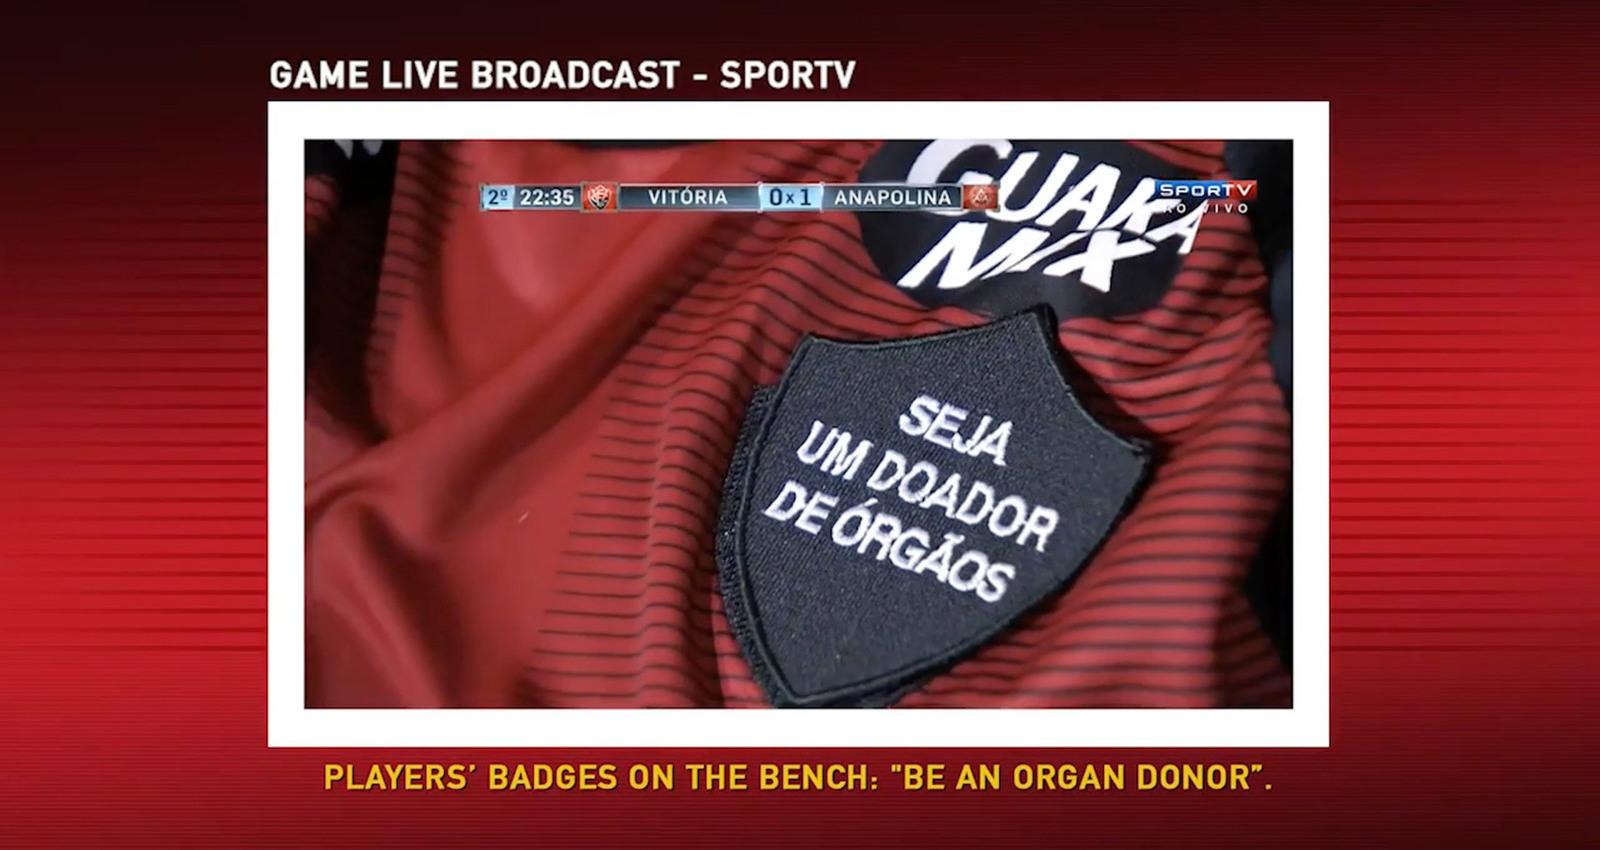 Donation Badges